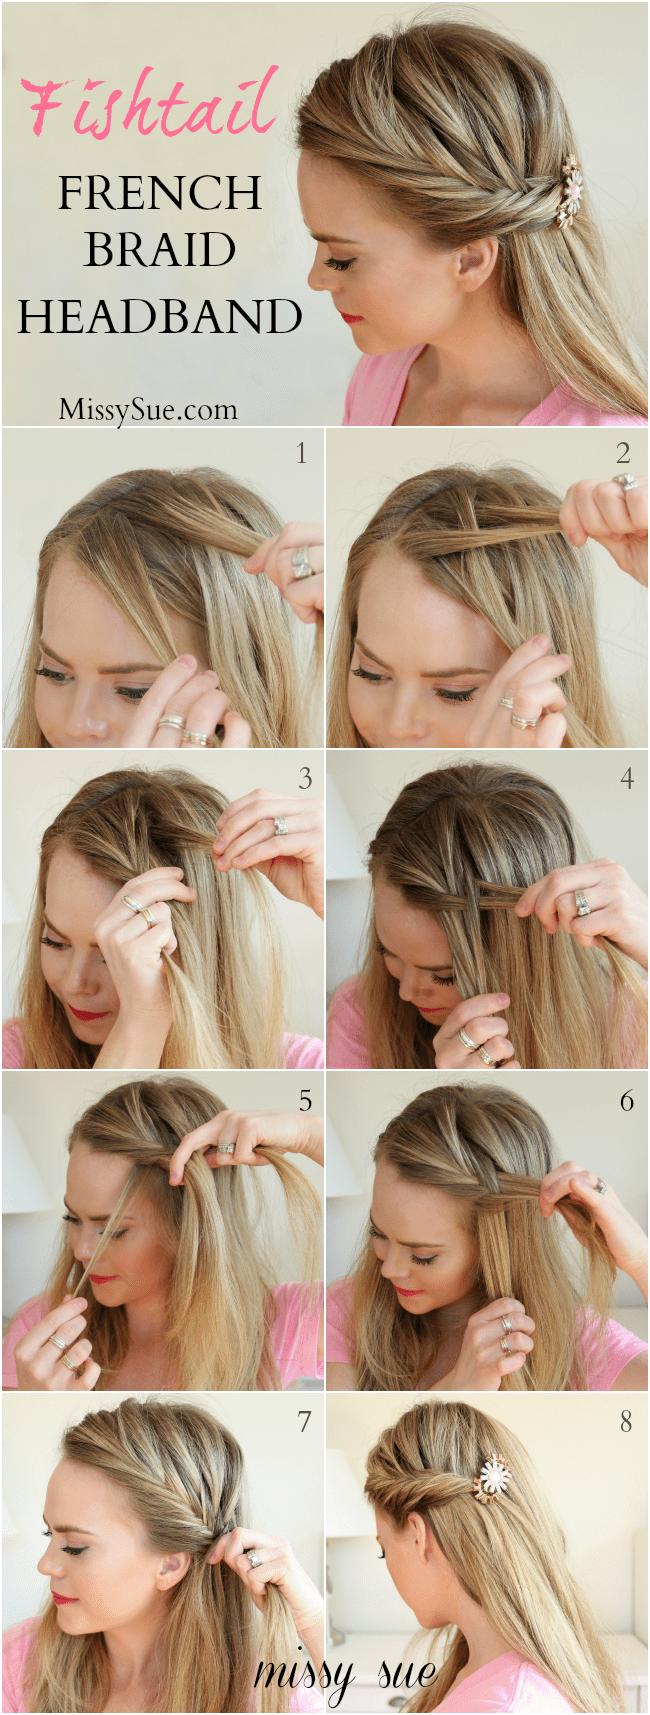 Fishtail French Braid Headband | MissySue.com